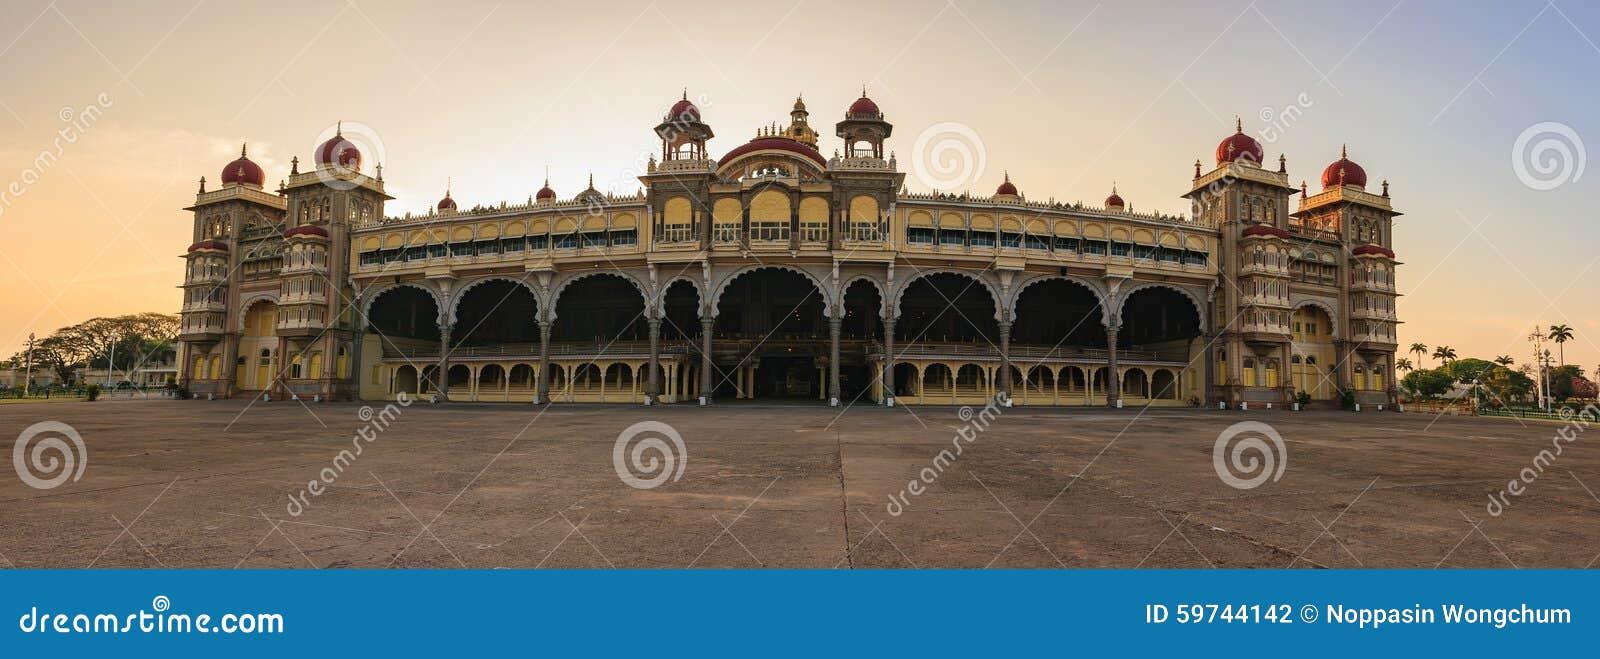 Дворец Майсура - Индия